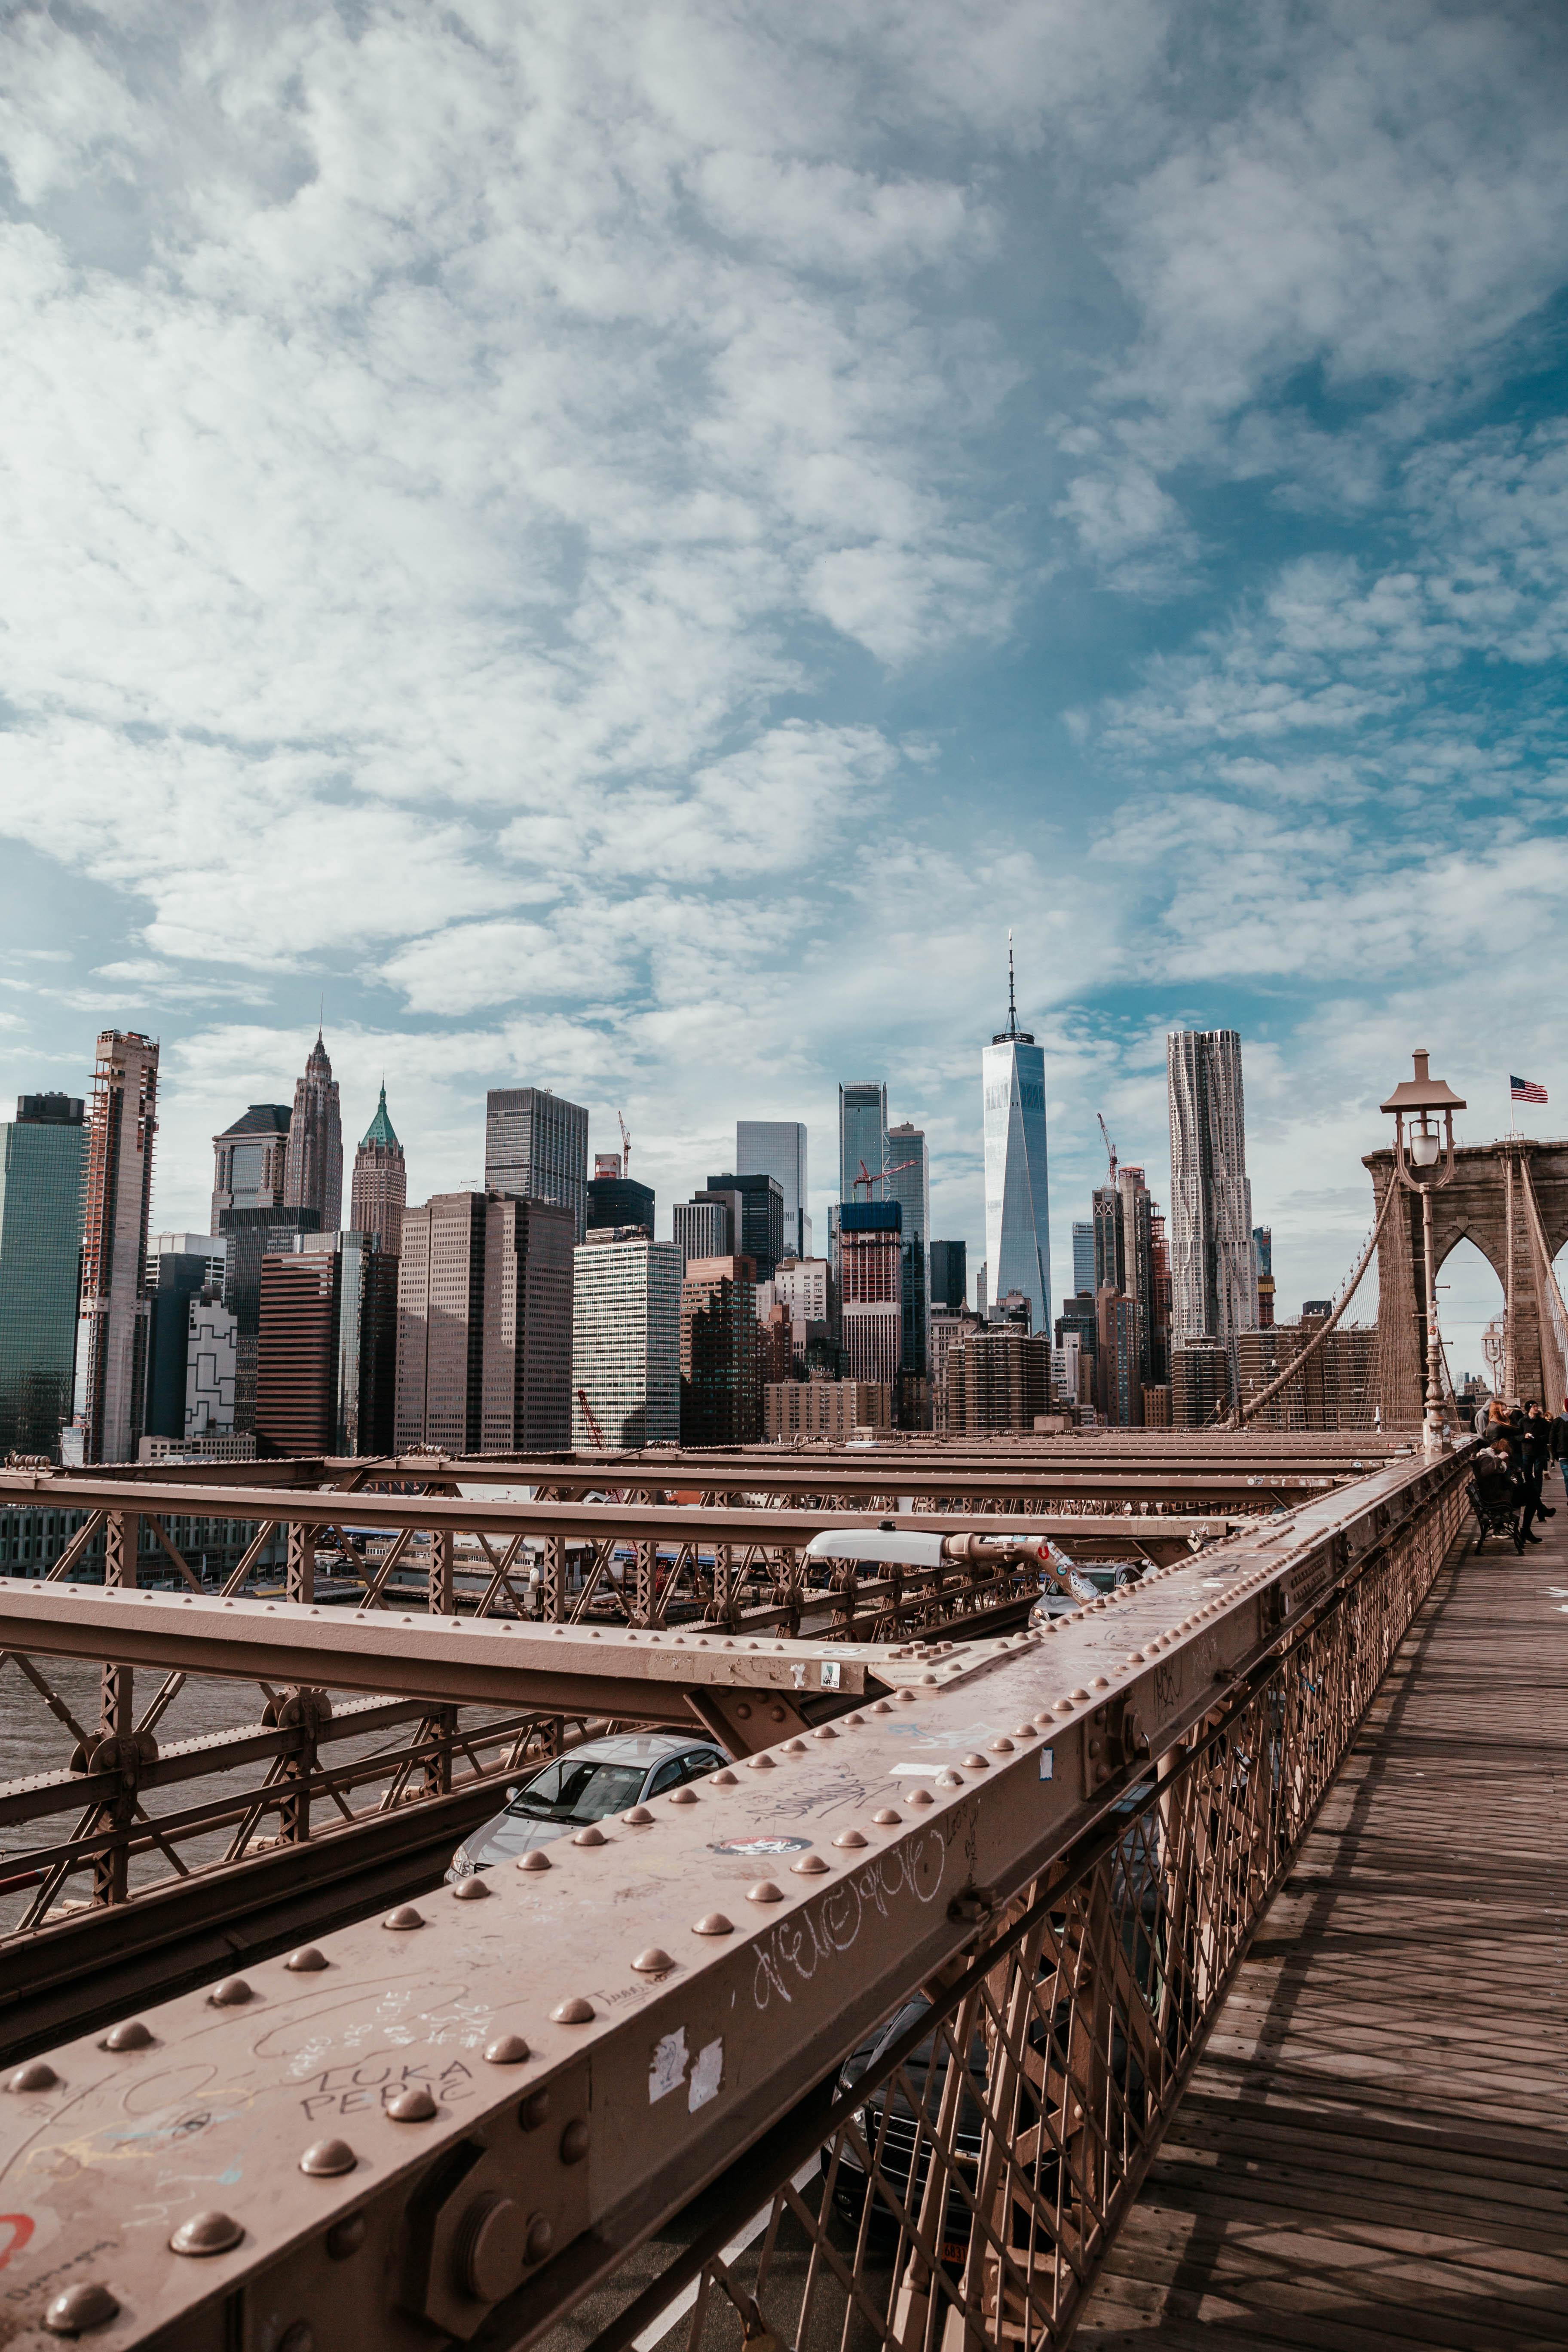 Photo Of Brooklyn Bridge, New York